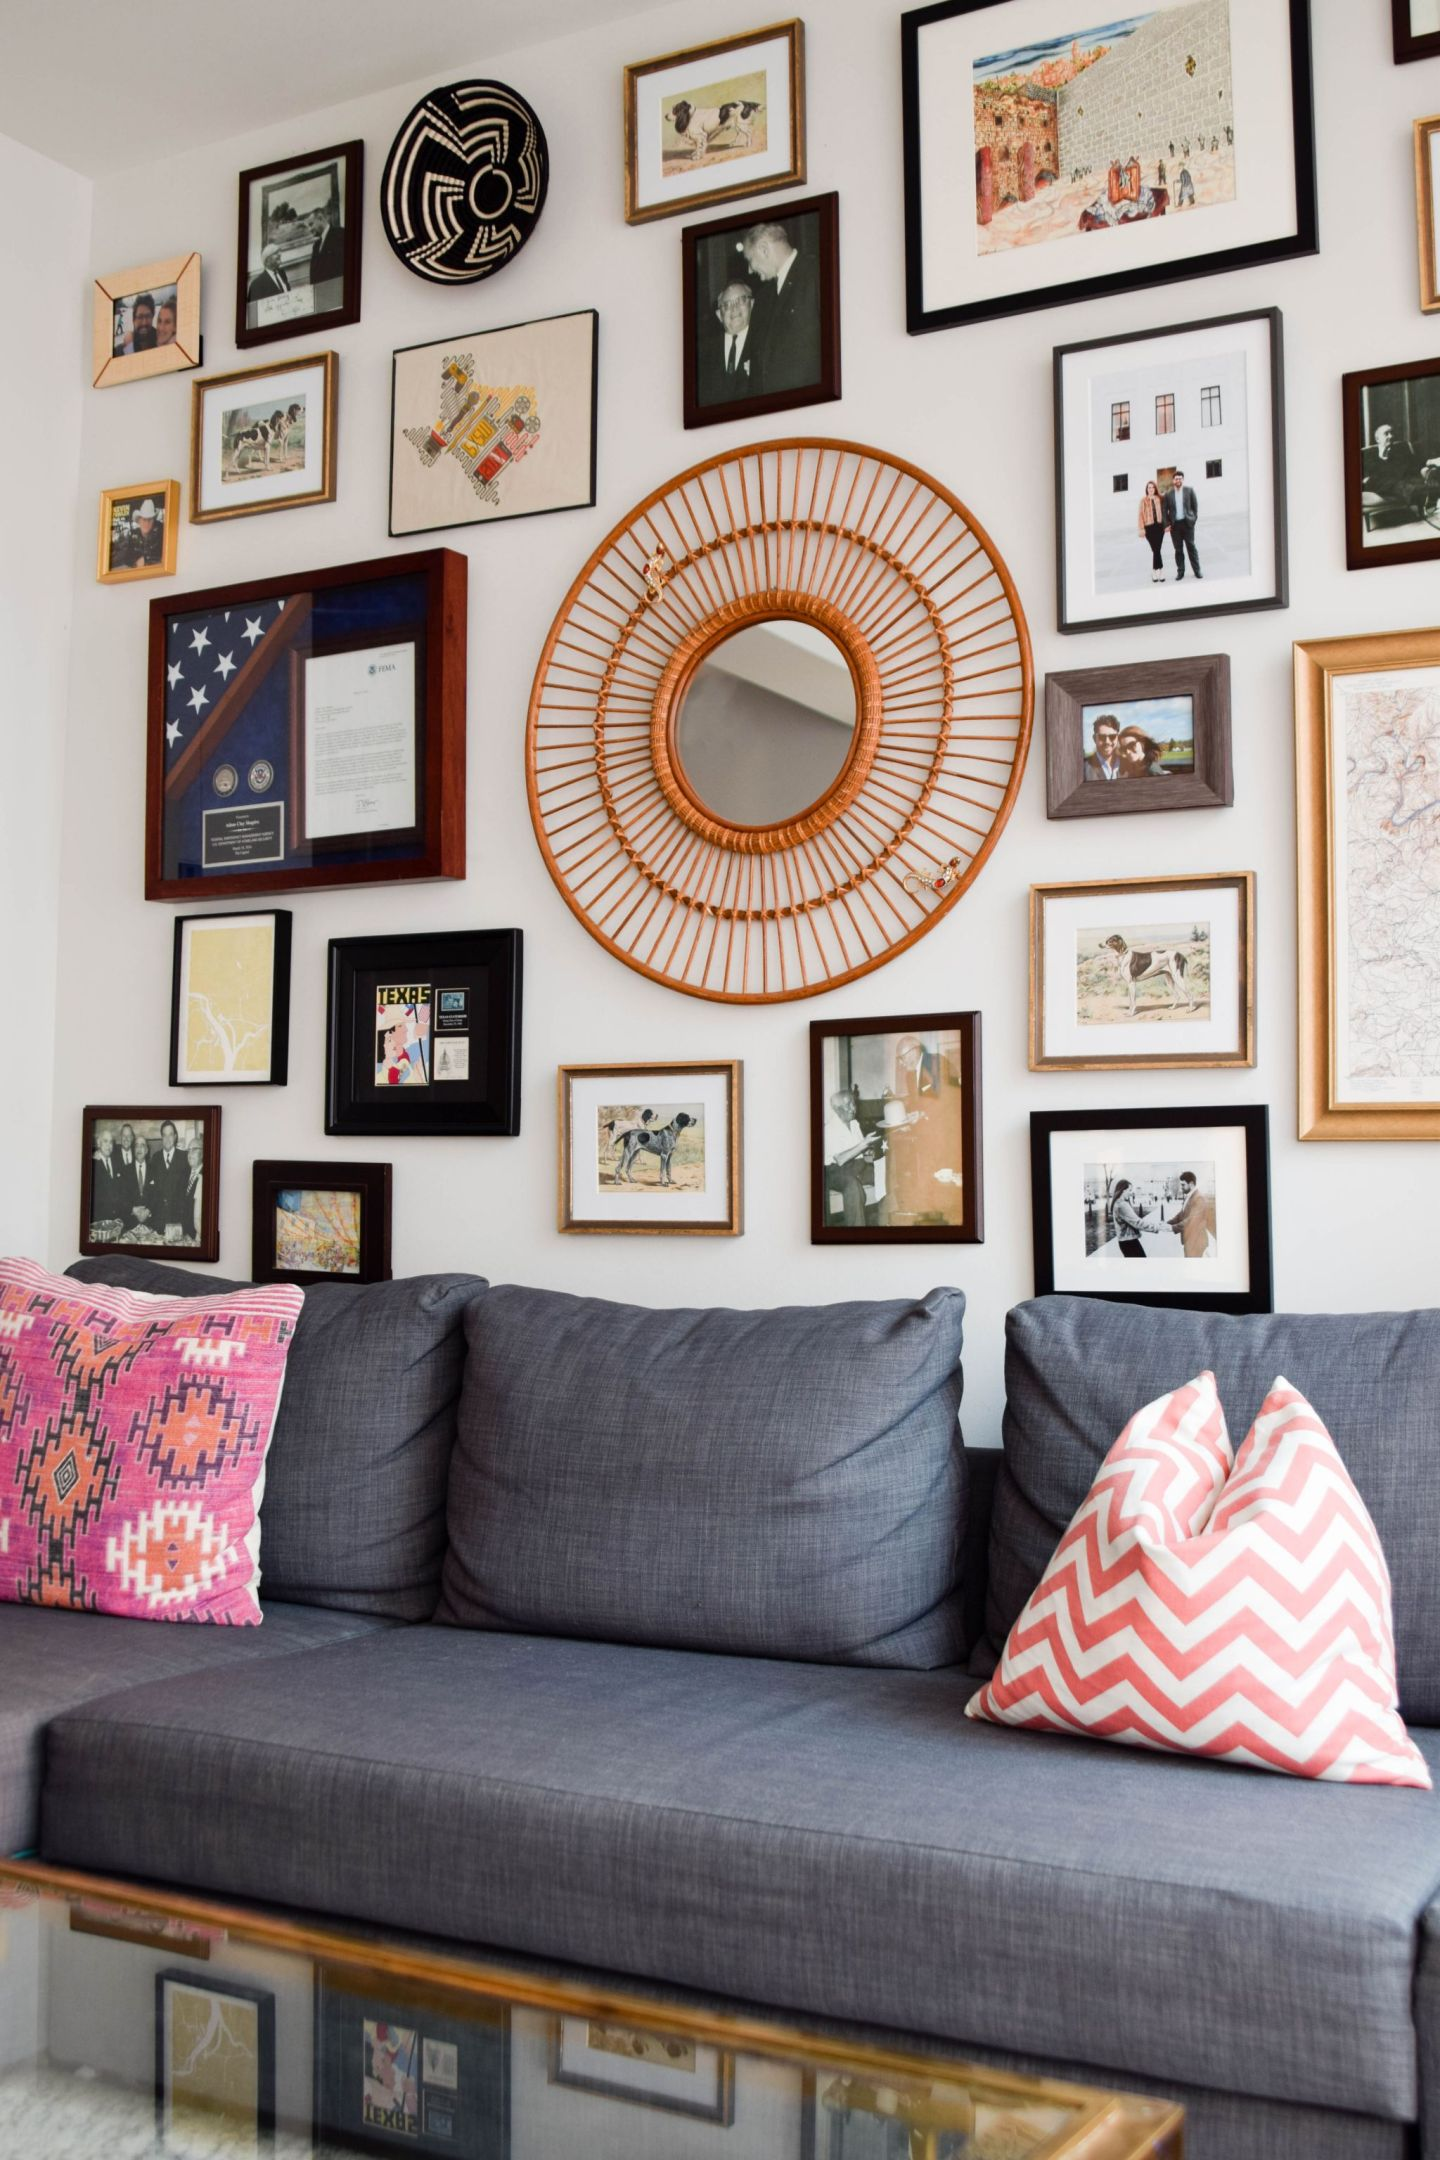 dc home tour - h street apartment